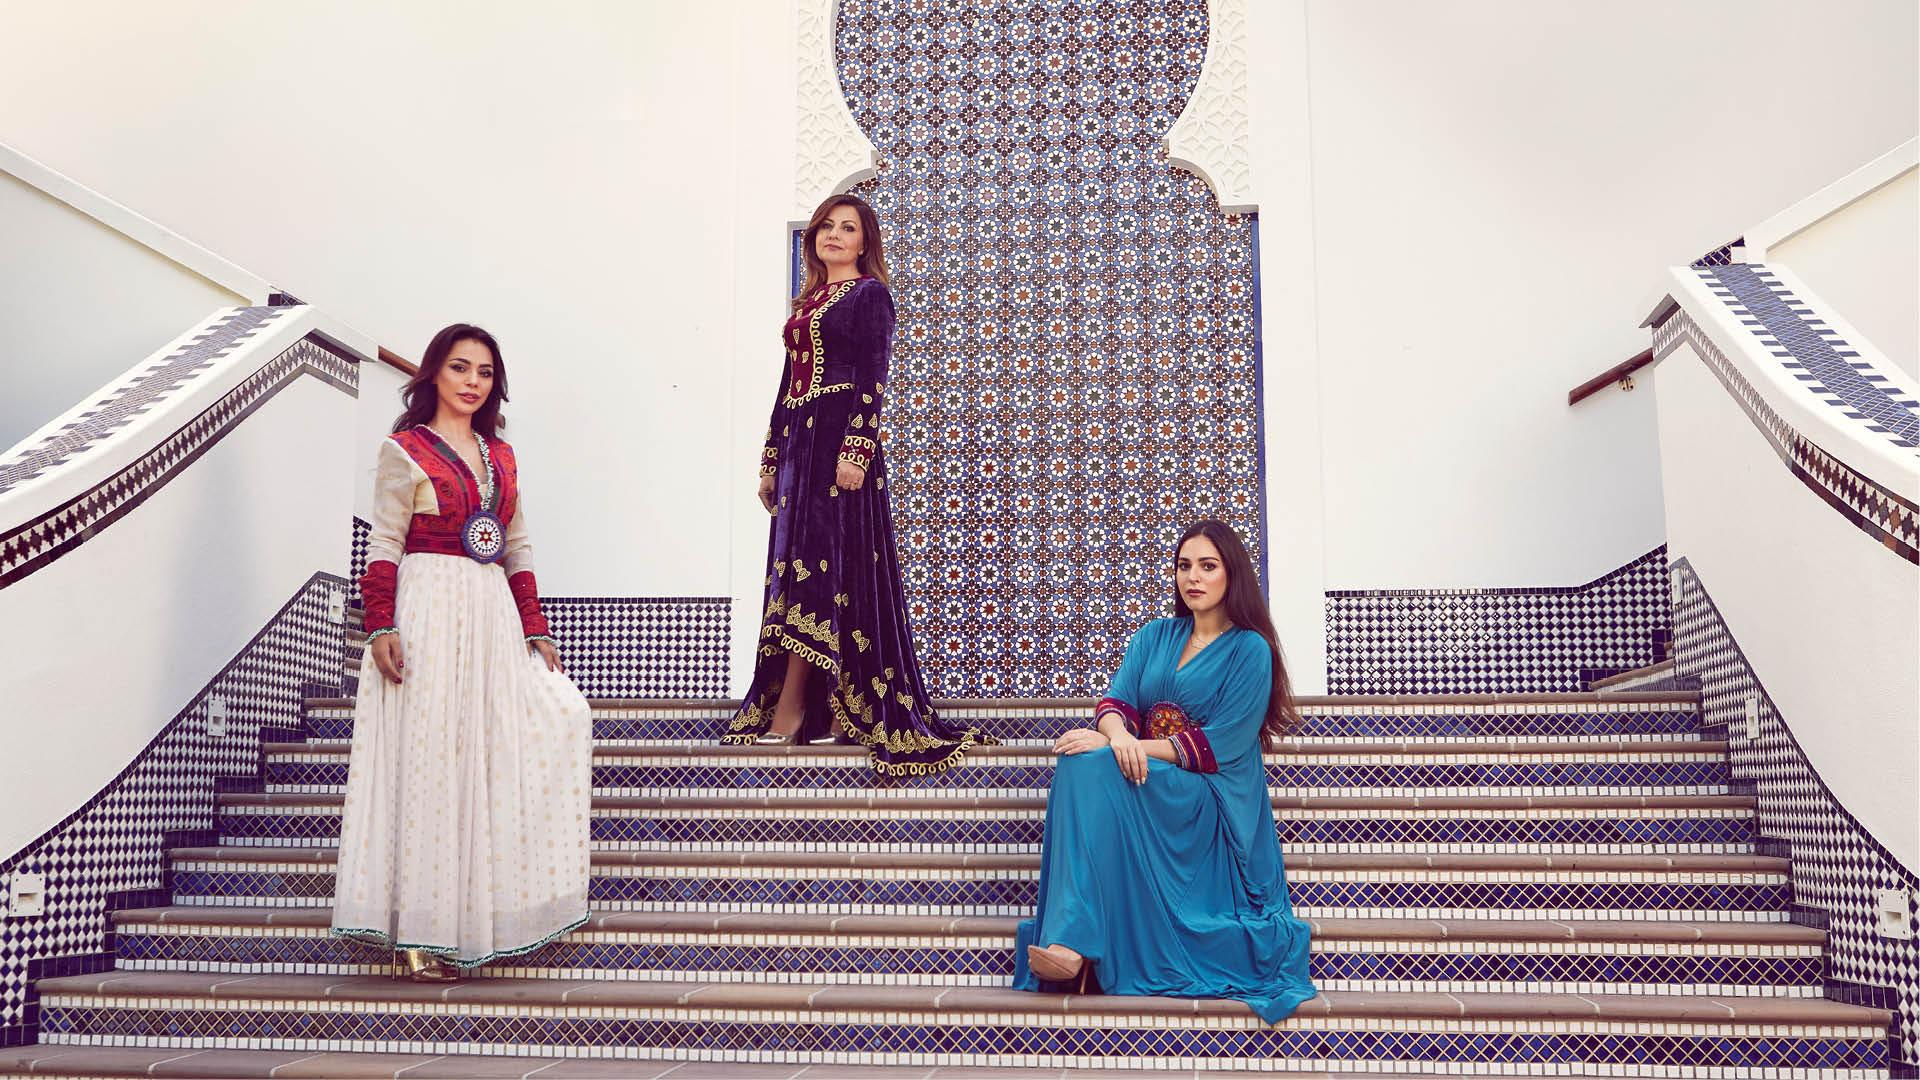 Art Of Afghanistan Tradition And Trends Harper S Bazaar